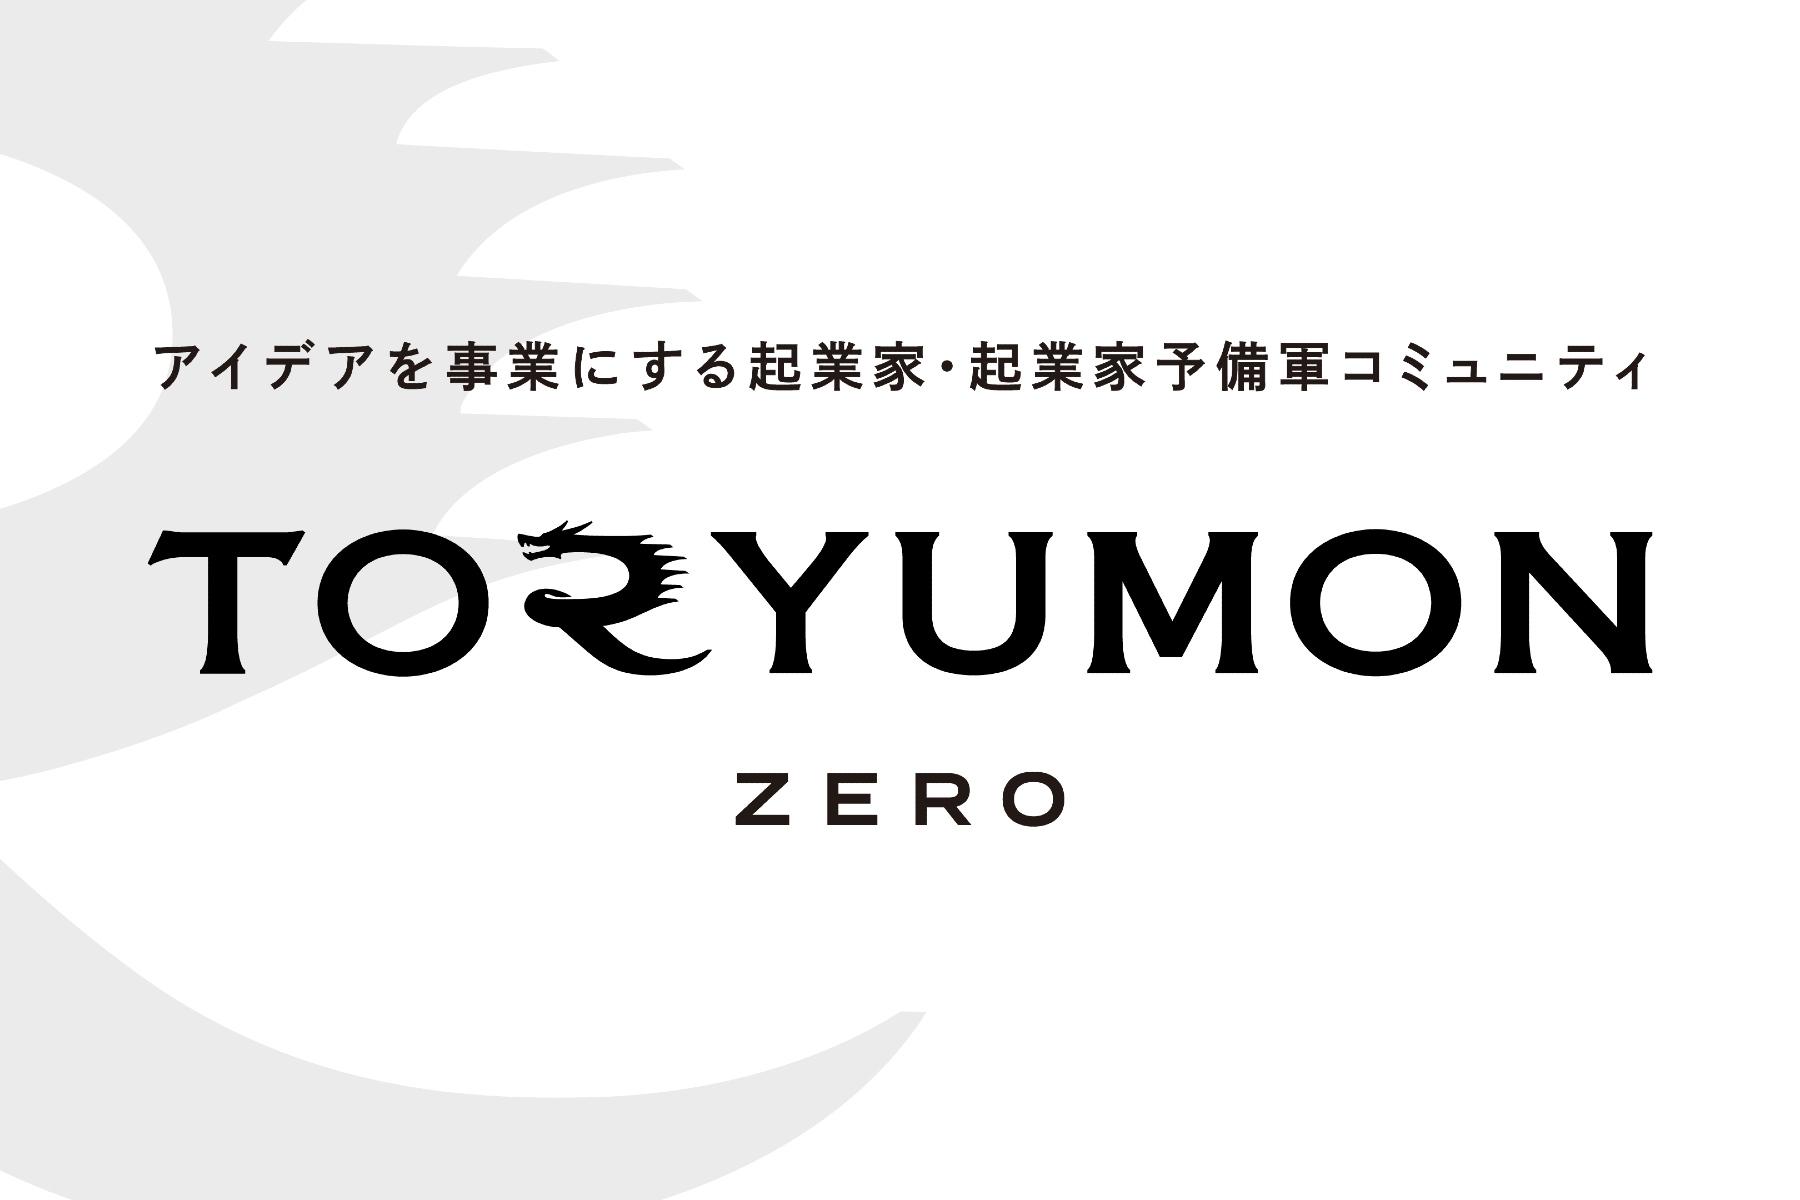 F Ventures | U25起業家・起業家予備軍コミュニティ「TORYUMON ZERO」の第1期メンバー募集を開始